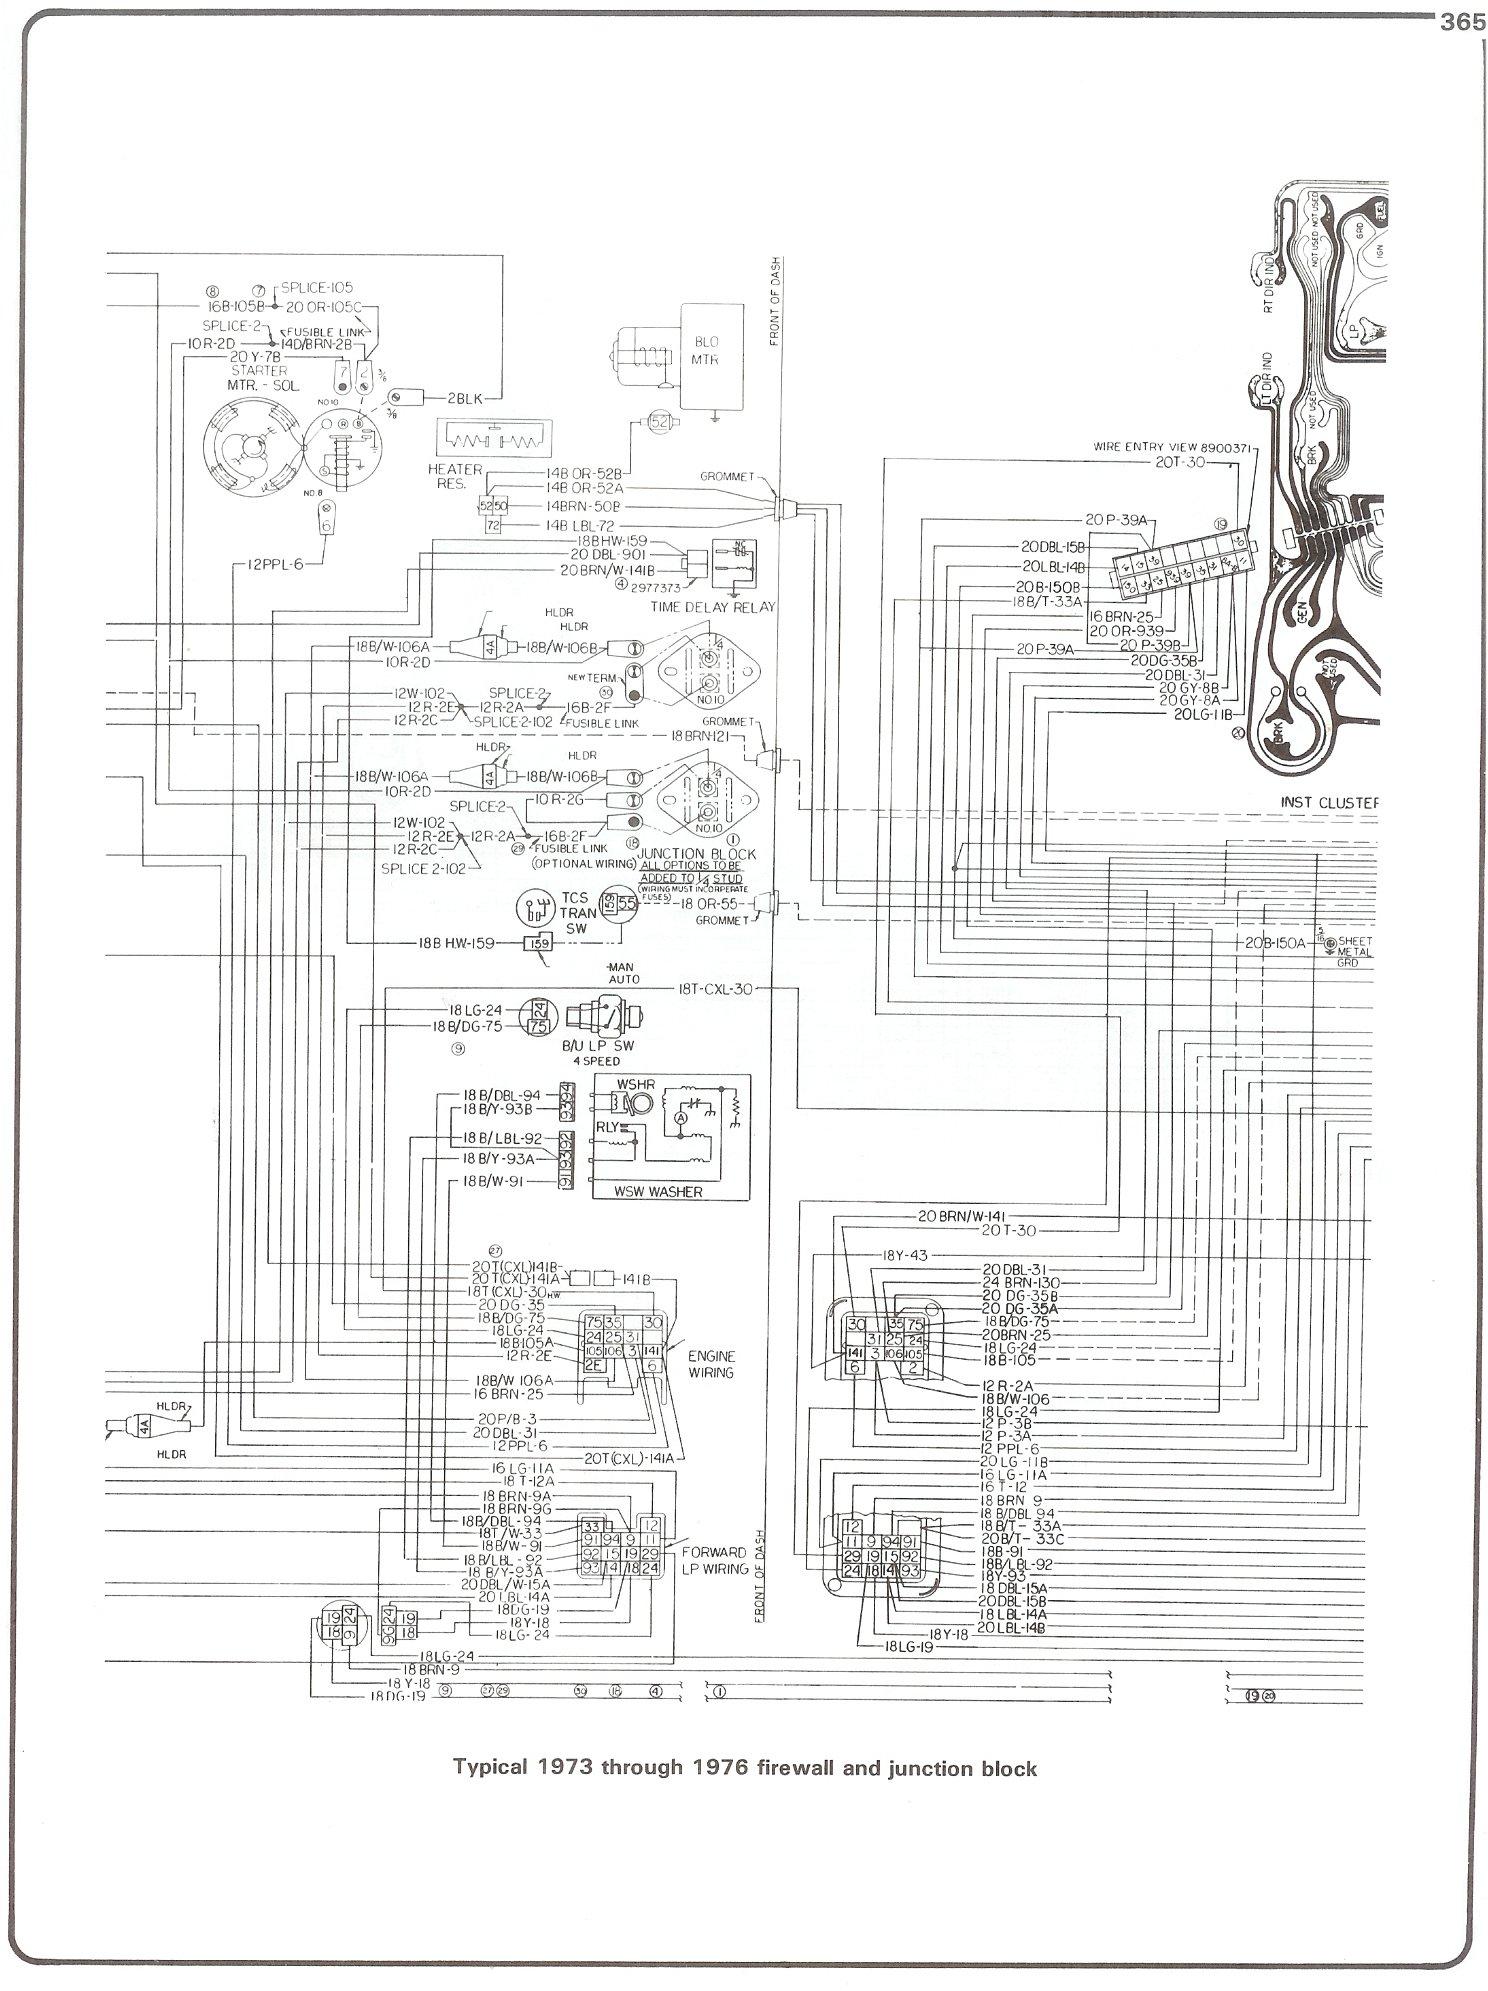 Phenomenal 1978 Chevrolet Fuse Box Wiring Diagram Tutorial Wiring Cloud Apomsimijknierdonabenoleattemohammedshrineorg